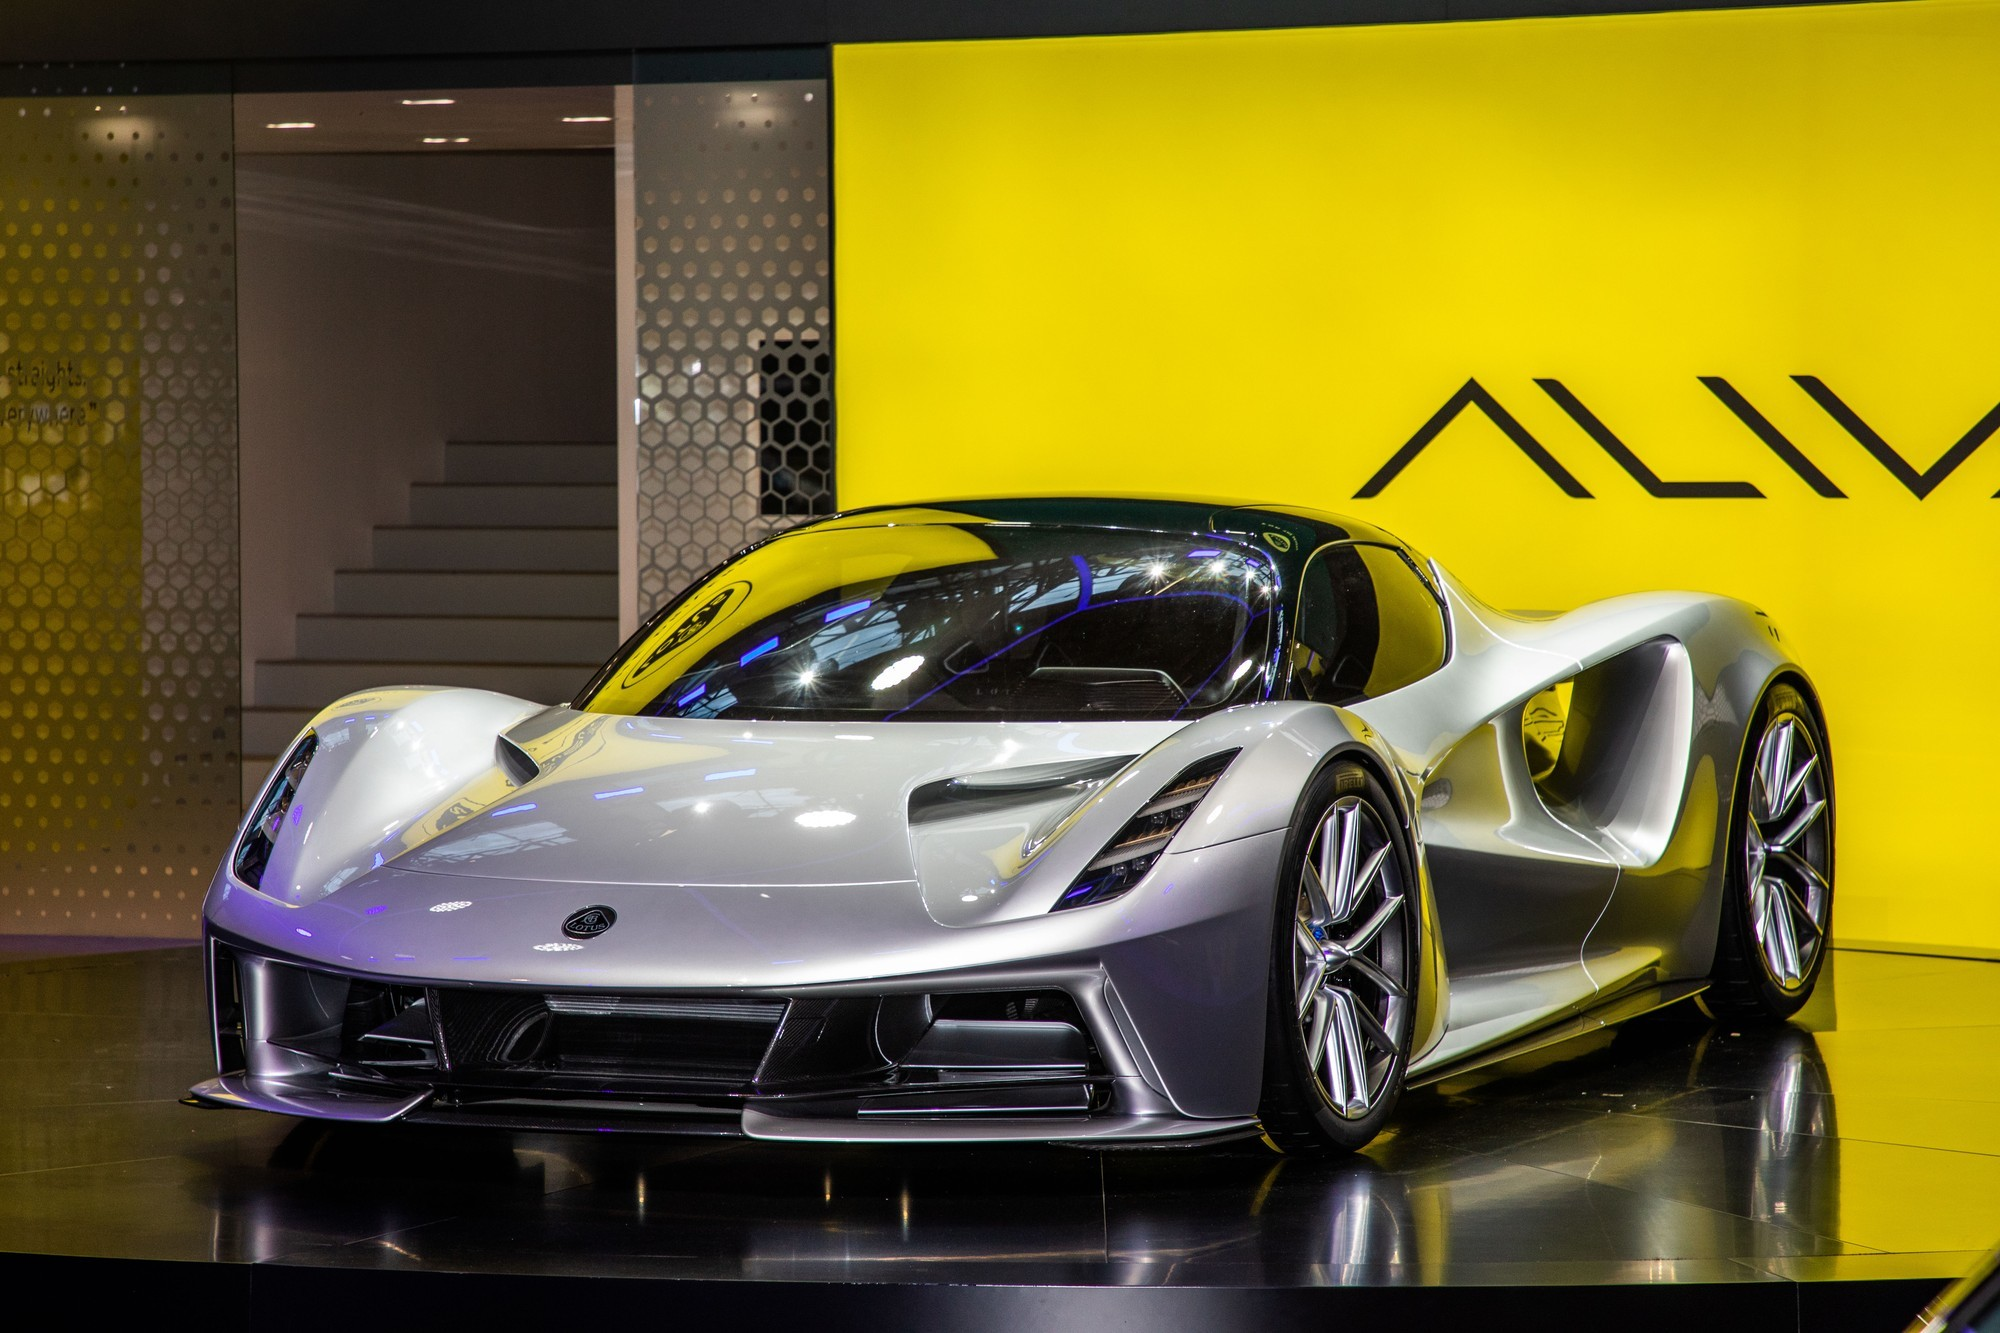 Ушли, не заплатив: Williams подаёт в суд на компанию Lotus Cars